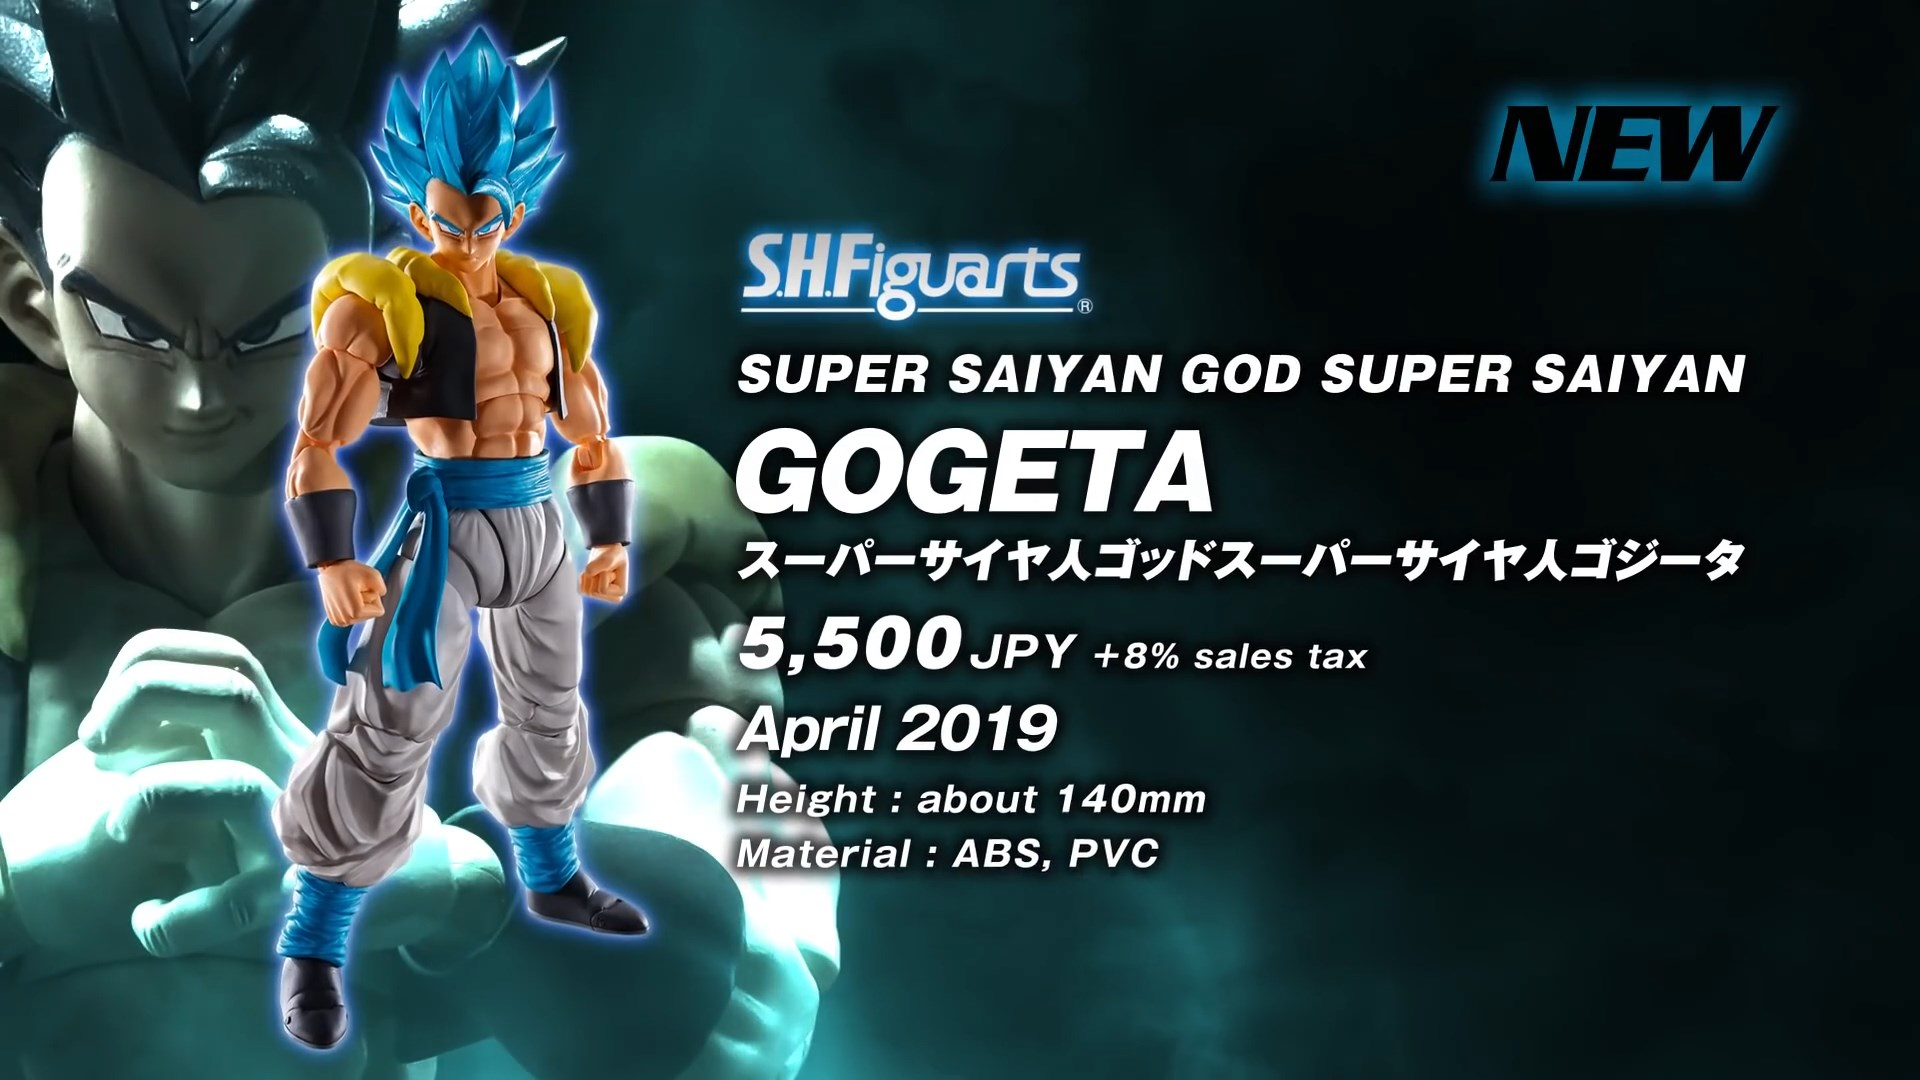 S.H.Figuarts Gogeta Super Saiyan Blue (SSGSS)